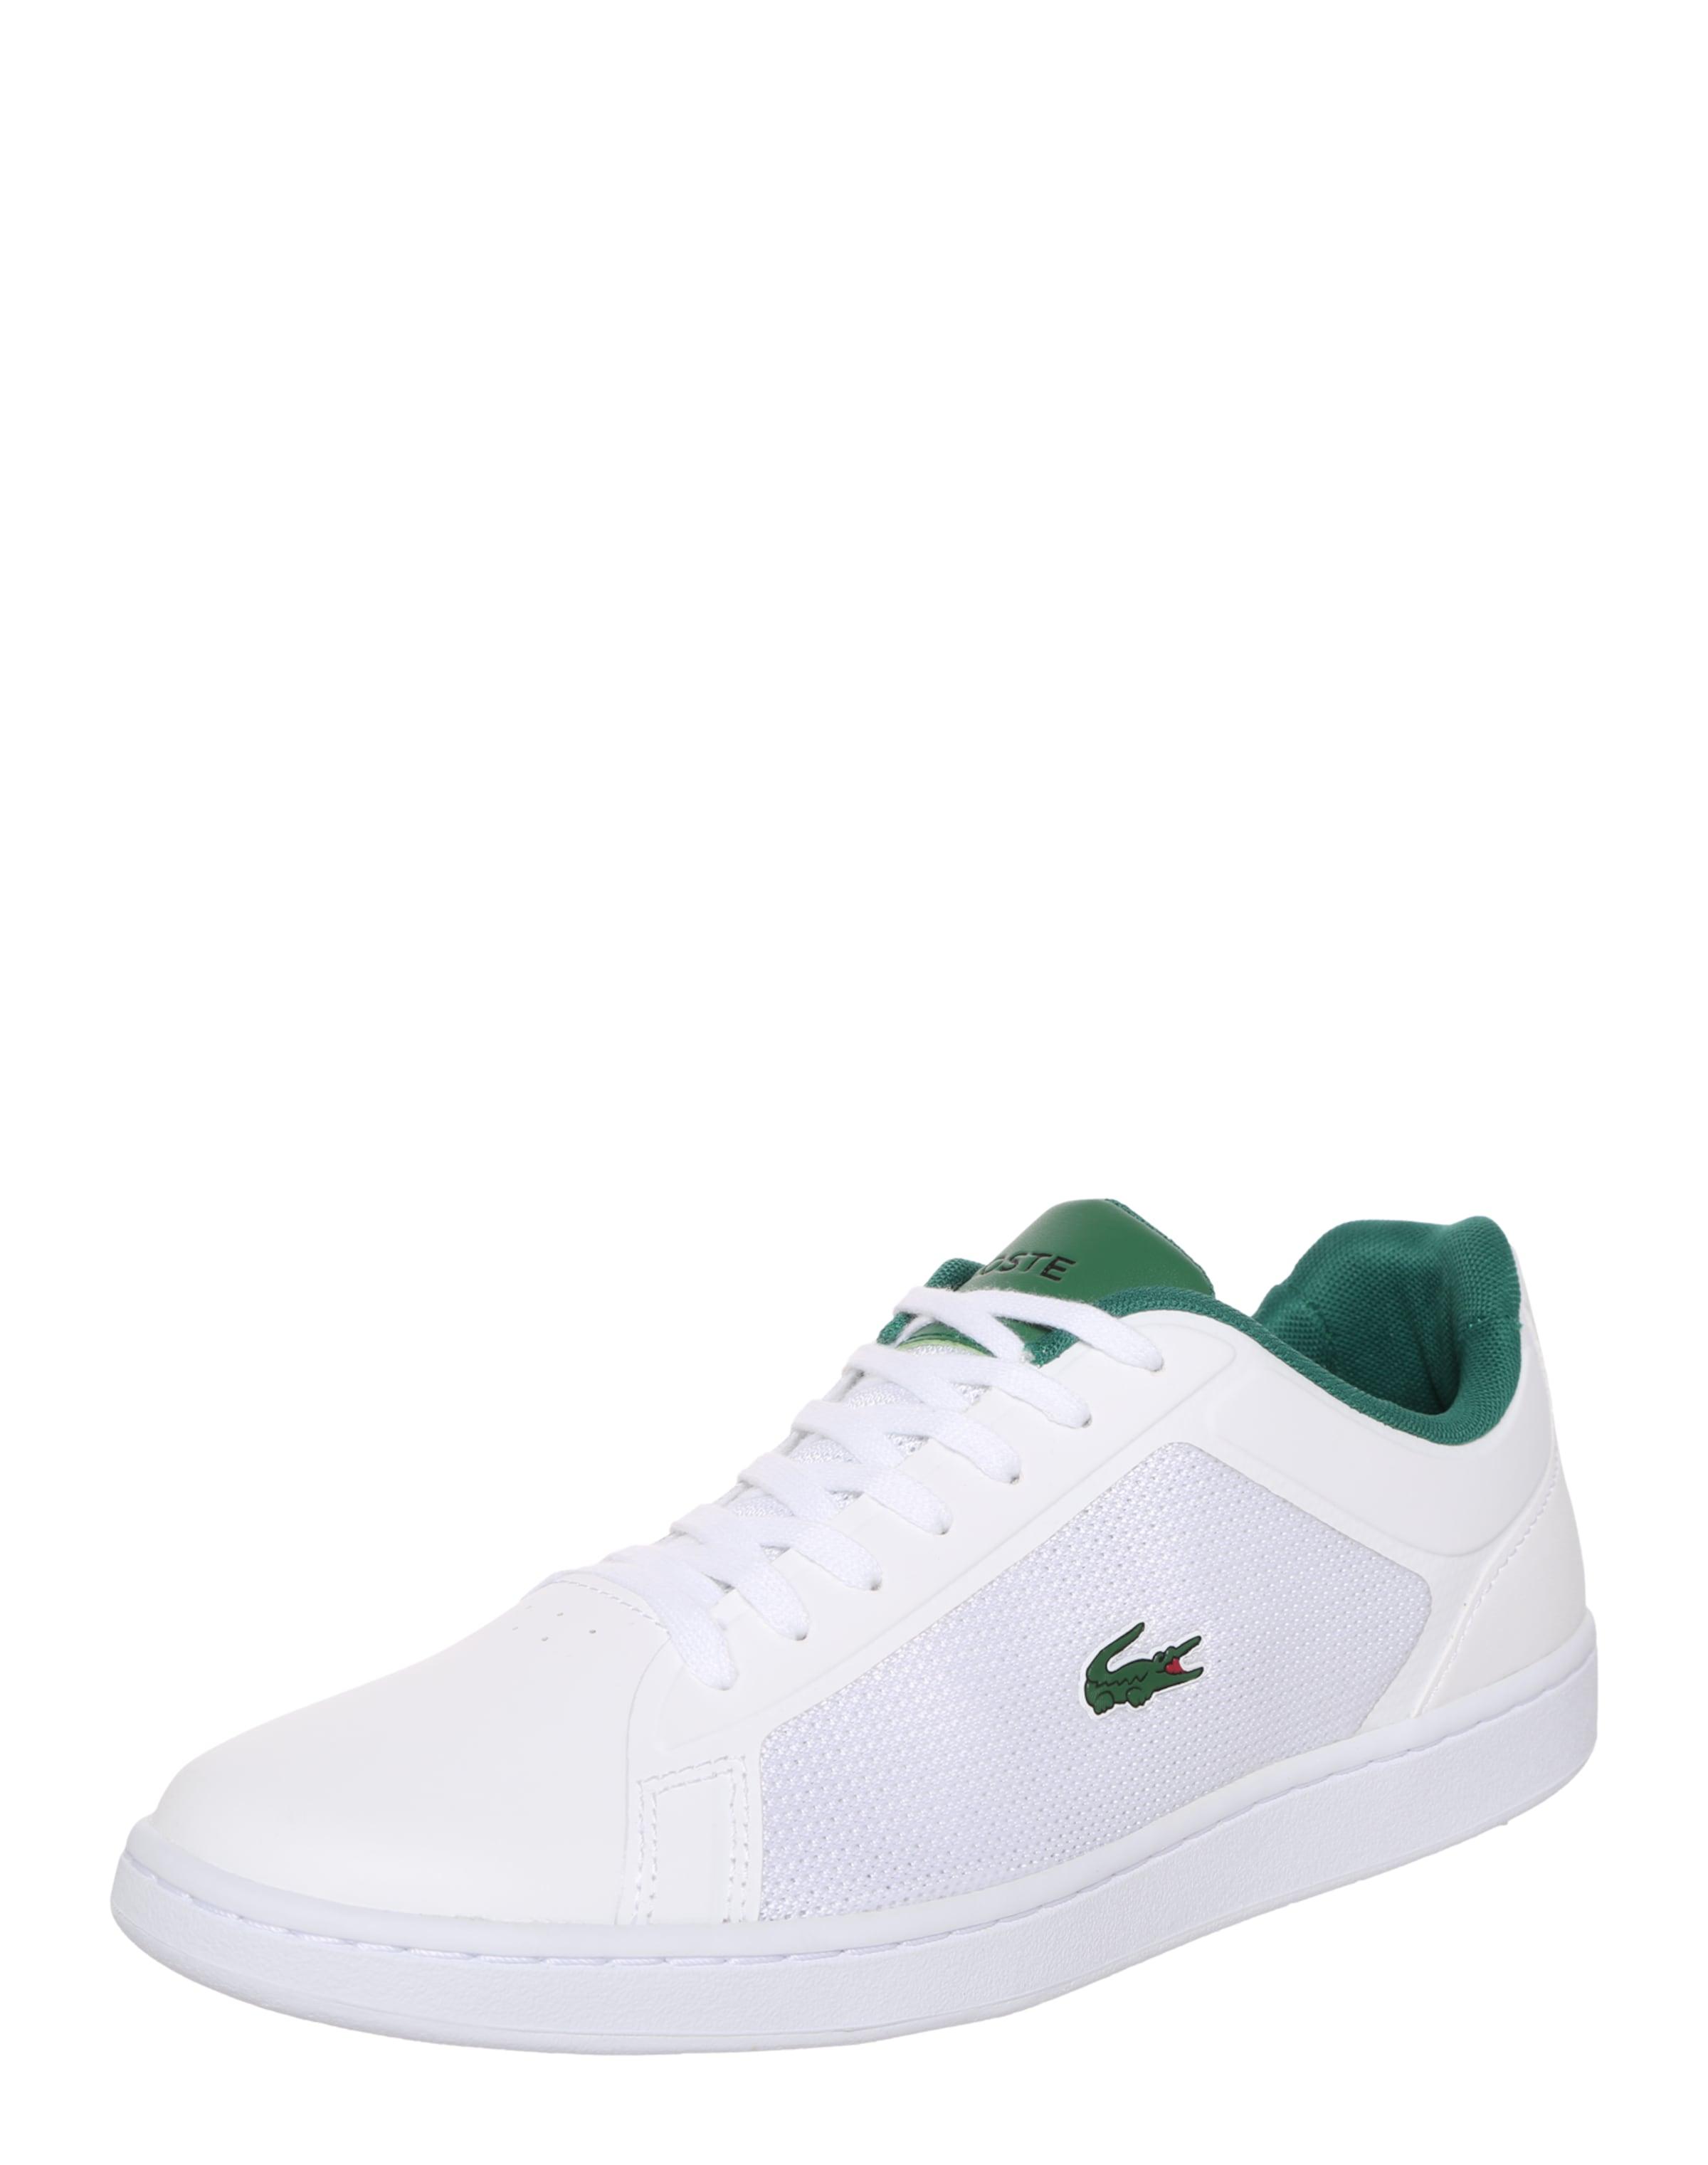 LACOSTE billige Sneaker Low Endliner Verschleißfeste billige LACOSTE Schuhe 074604